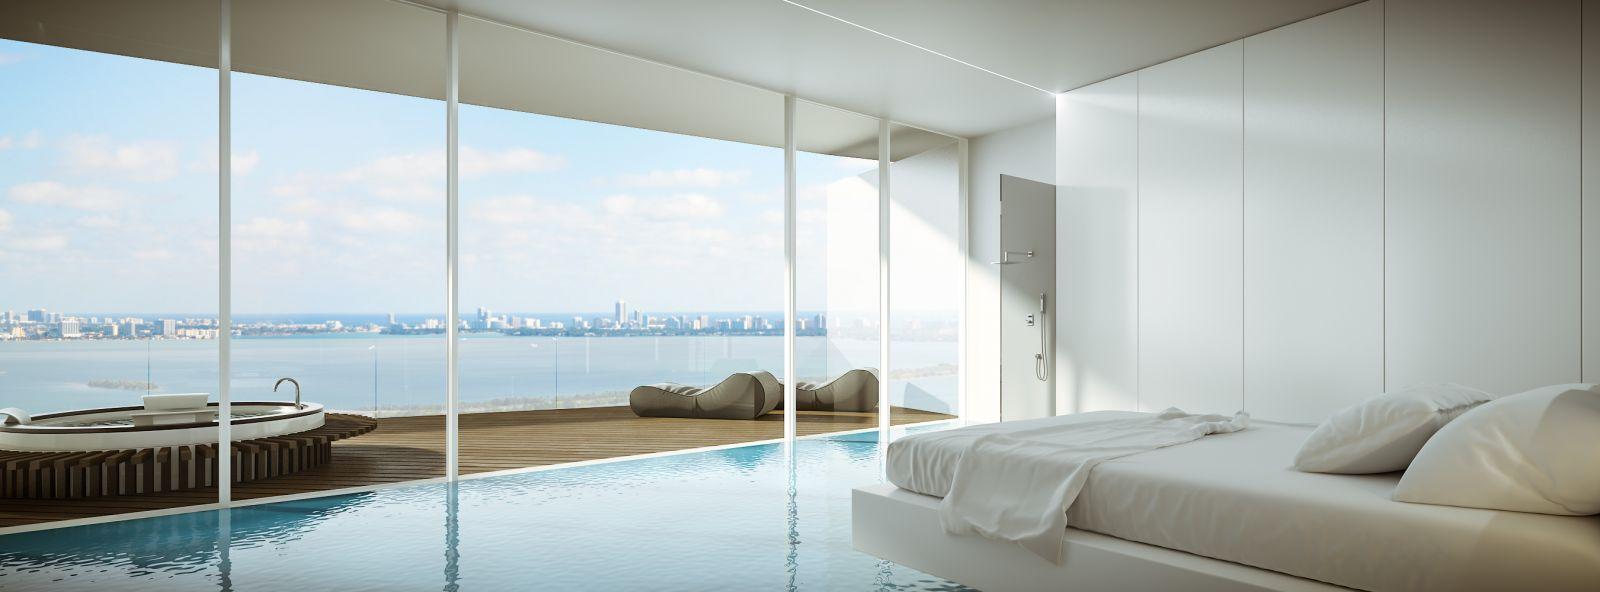 Rotating Towers - Miami 804